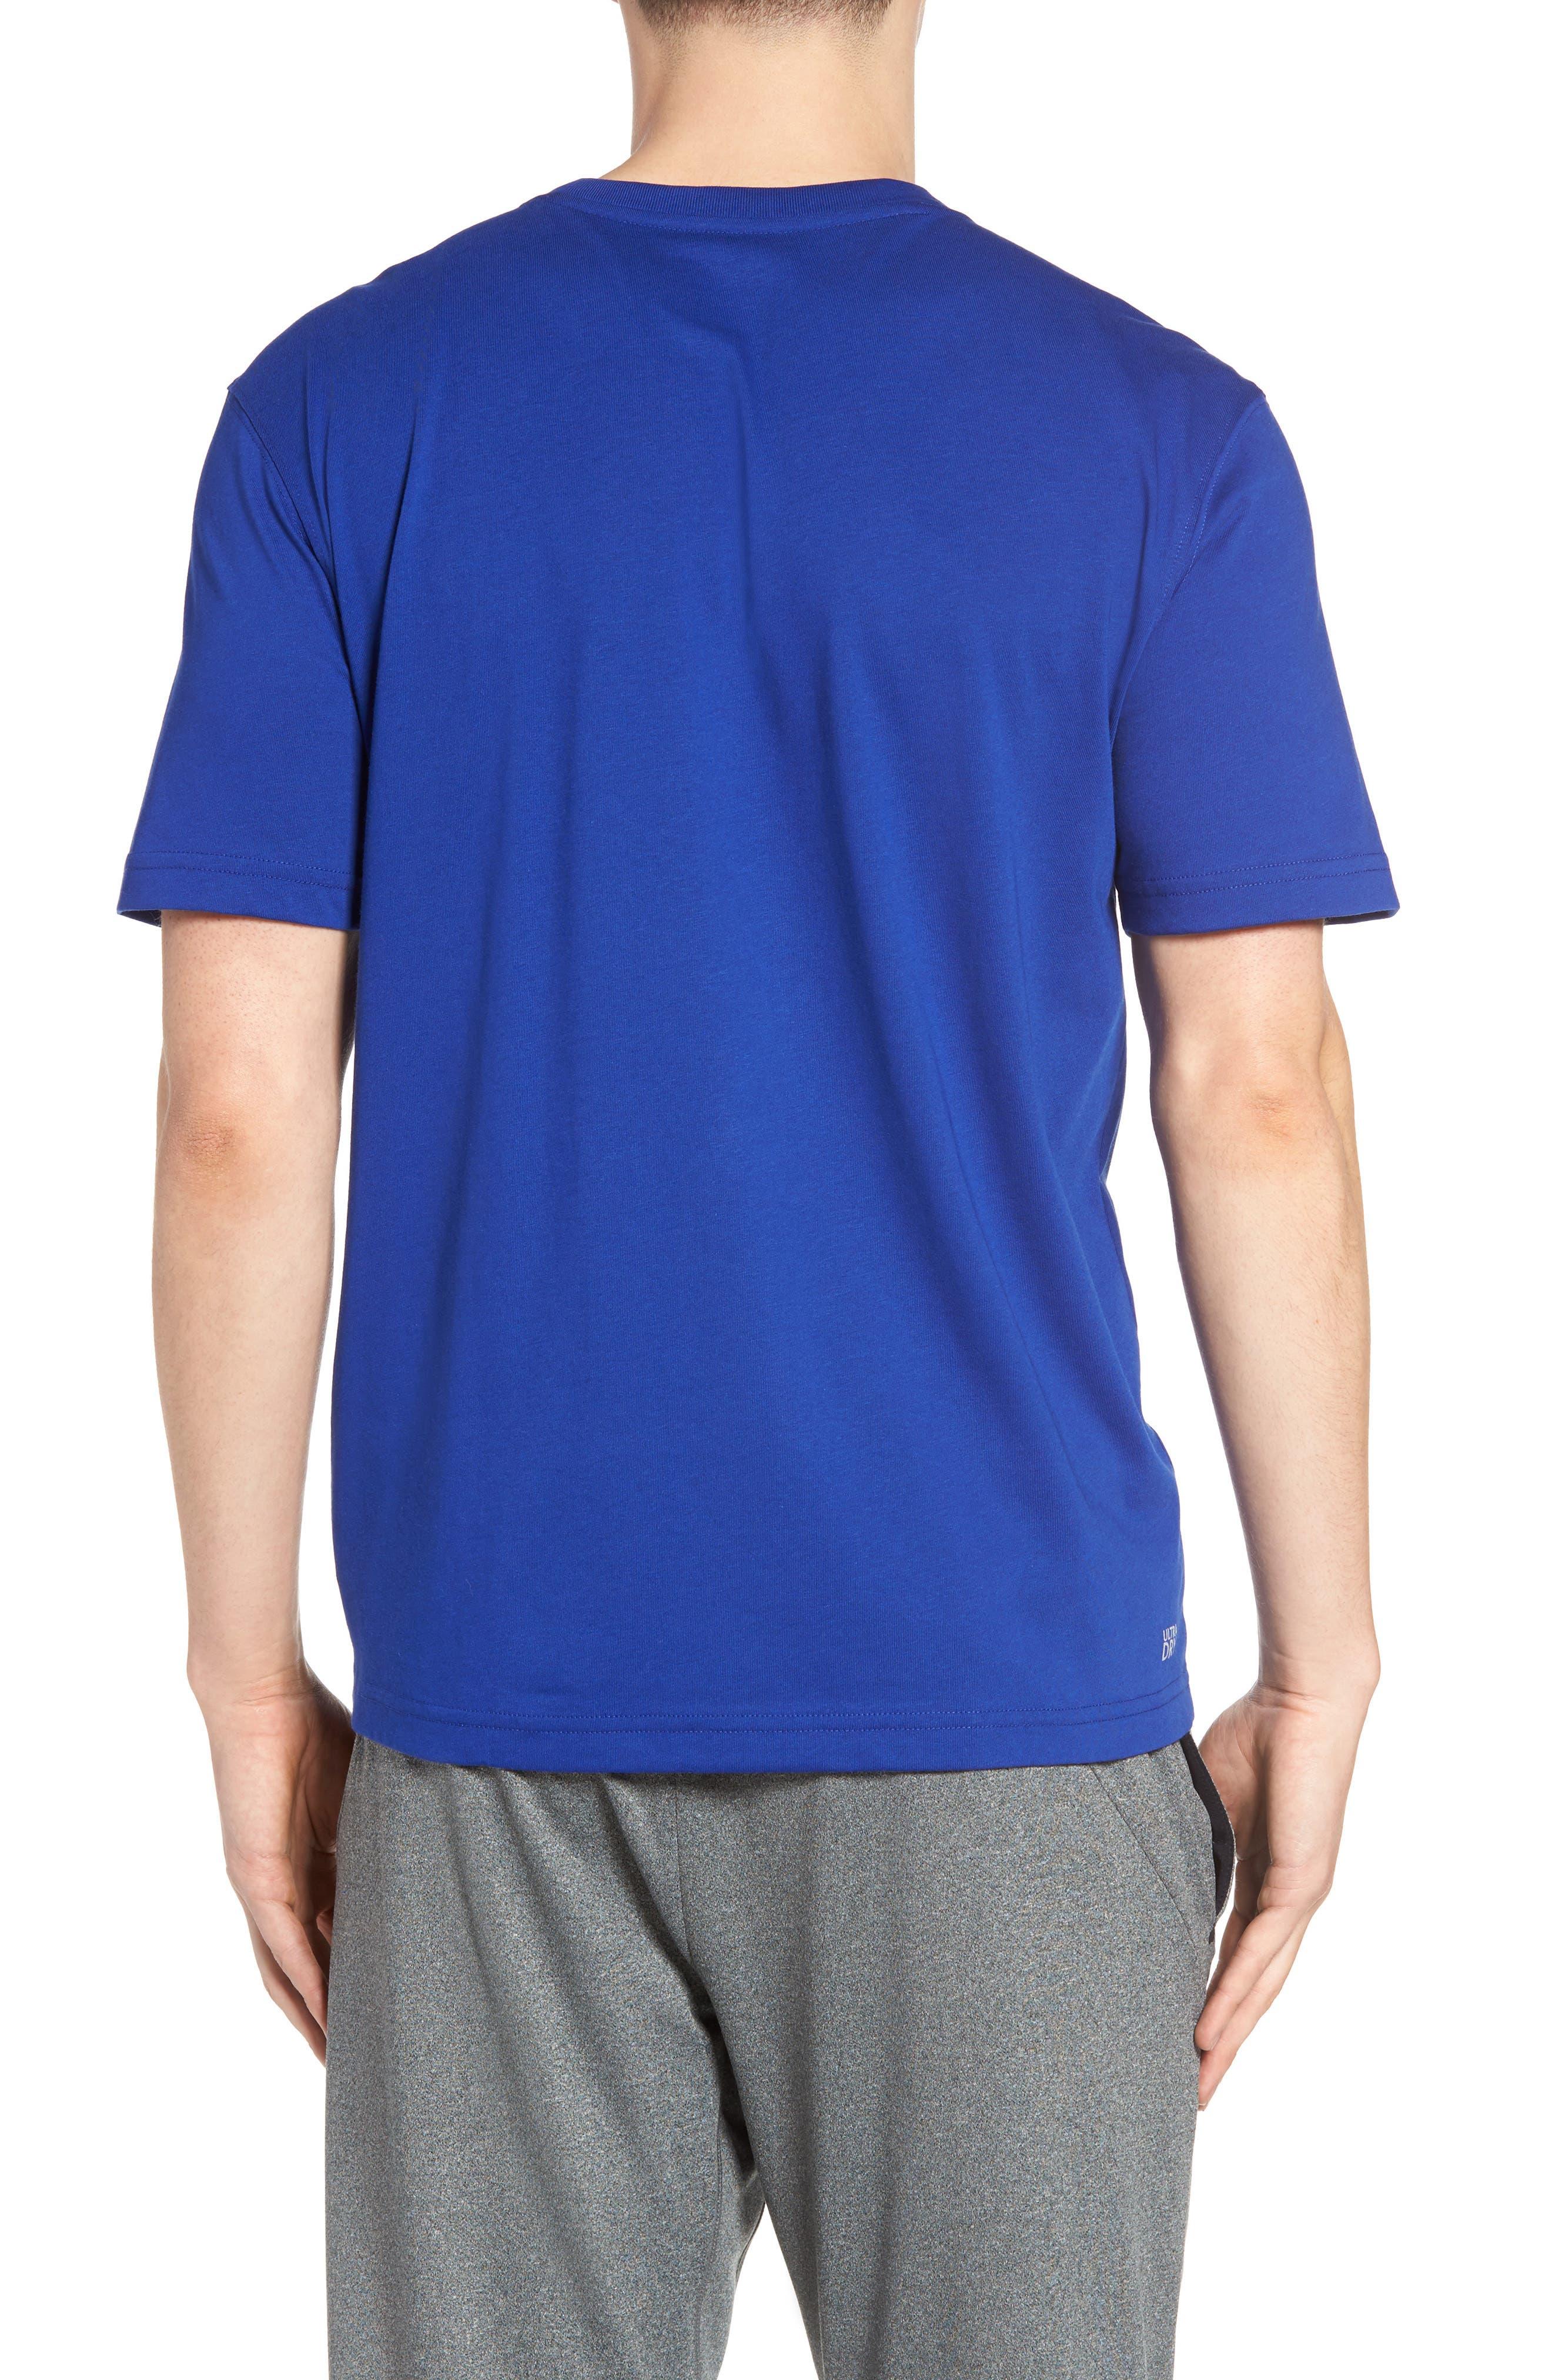 Alternate Image 2  - Lacoste'Sport' Cotton Jersey T-Shirt